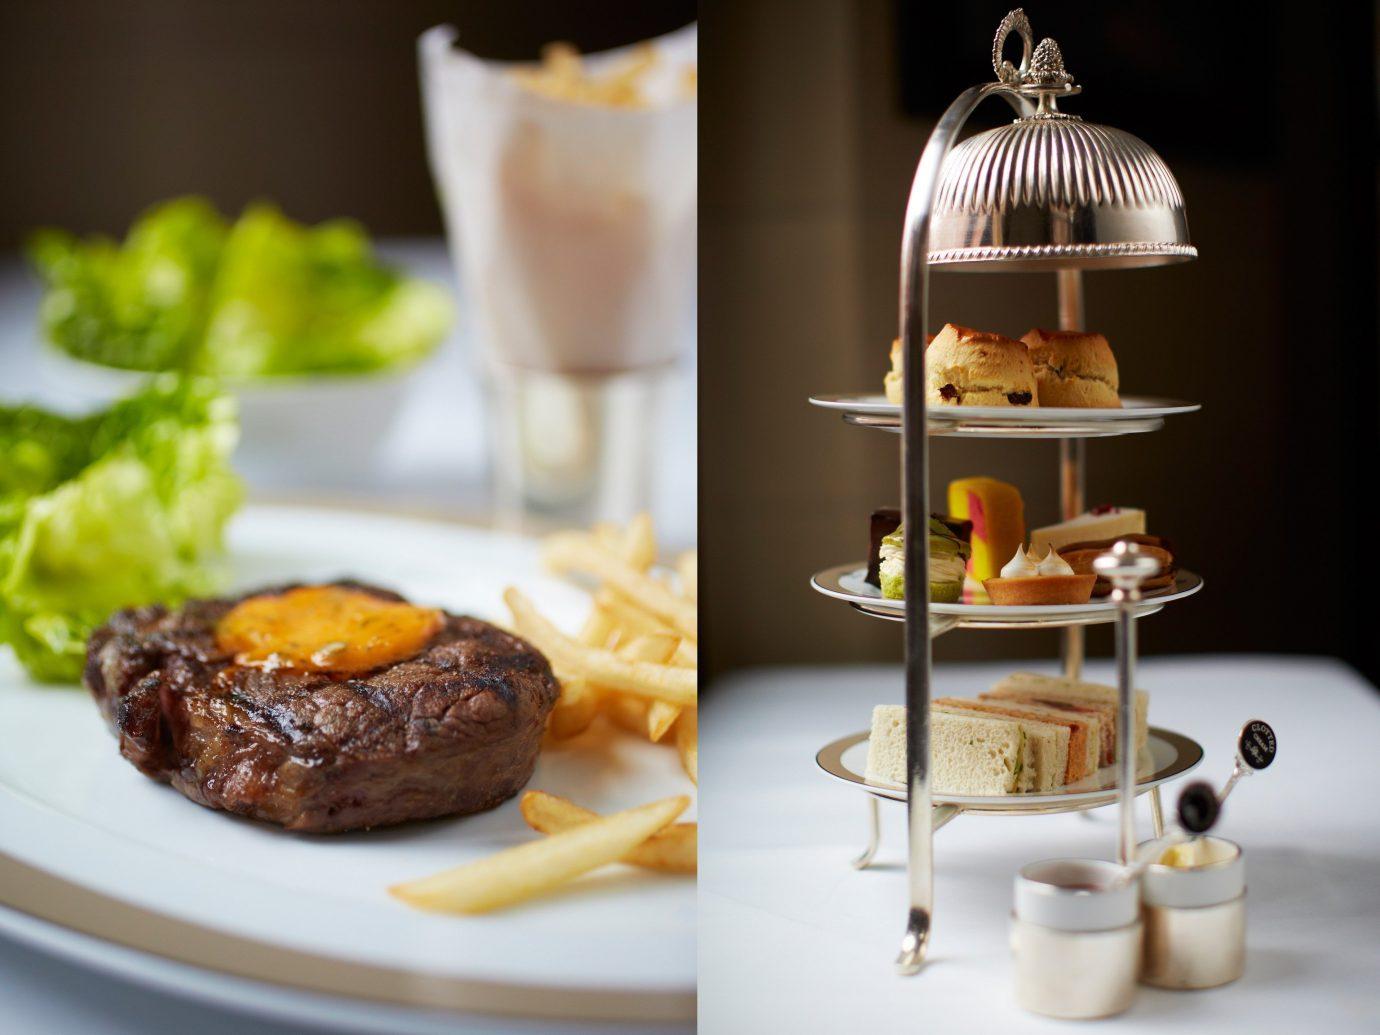 Food + Drink food plate dish meal breakfast meat brunch cuisine restaurant sense dessert